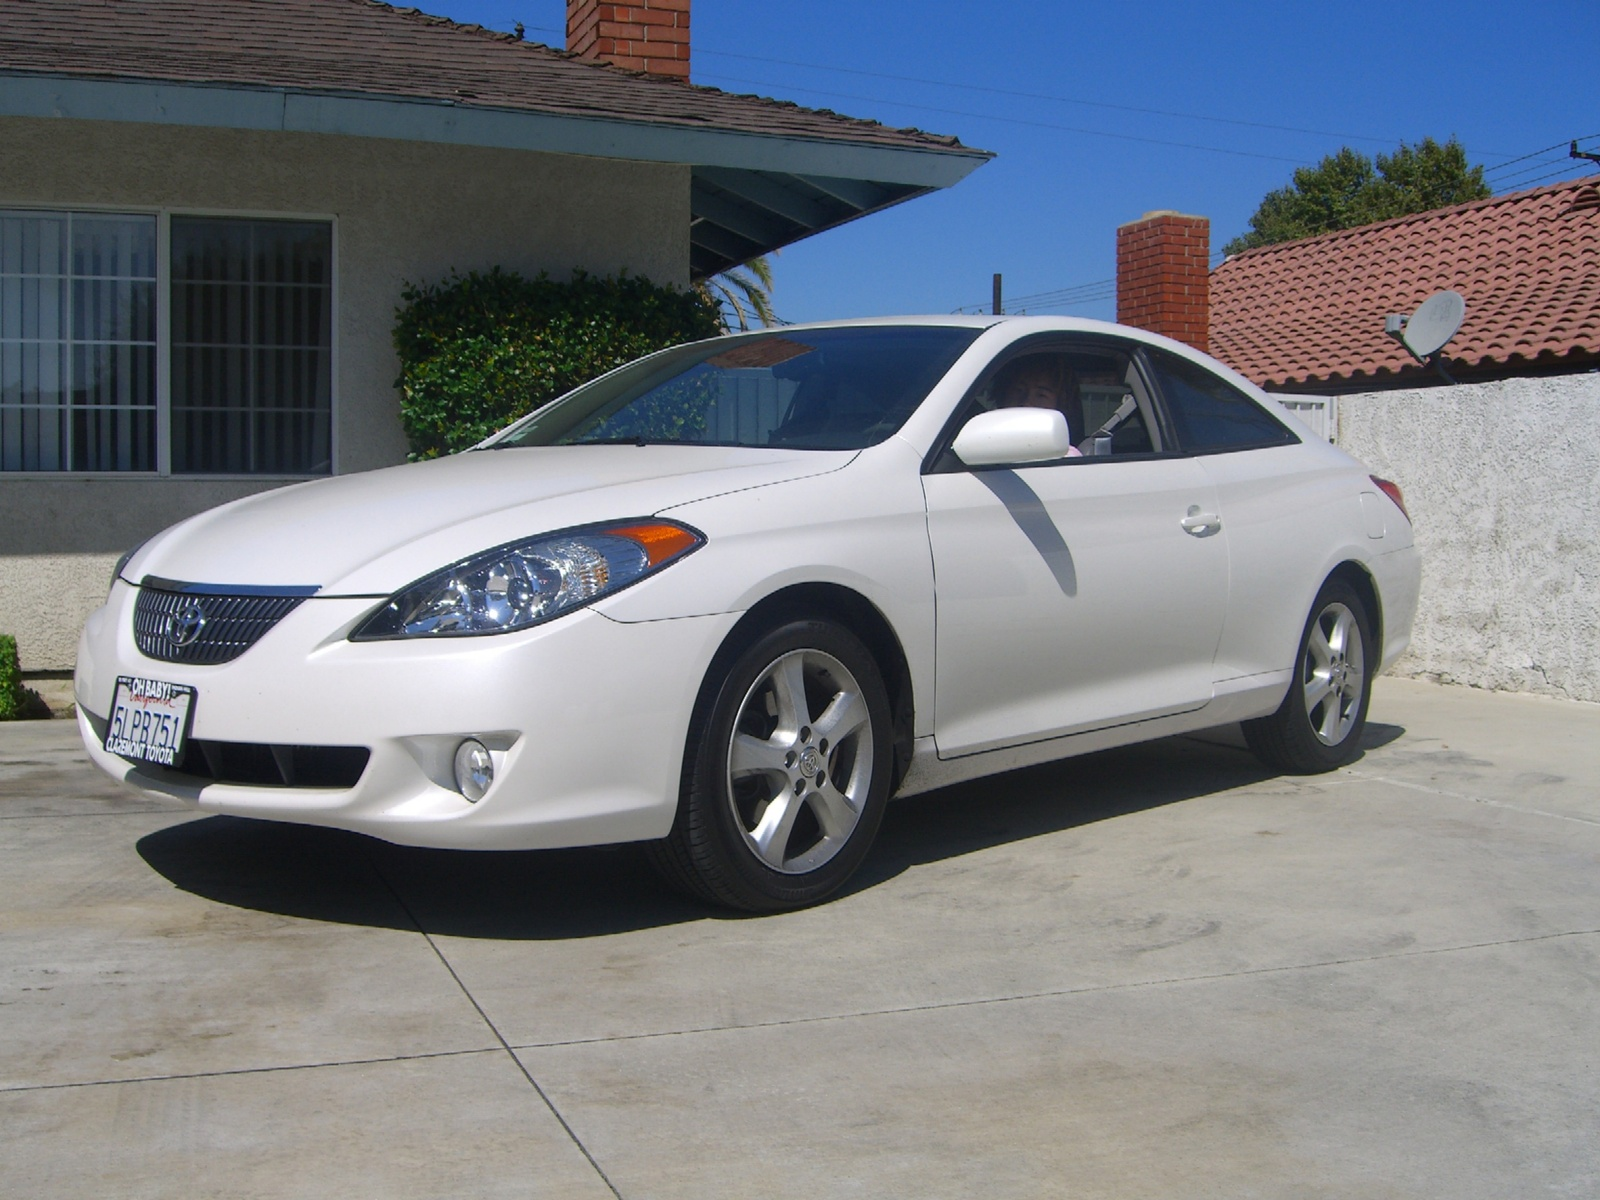 2007 Toyota Camry Solara Image 18